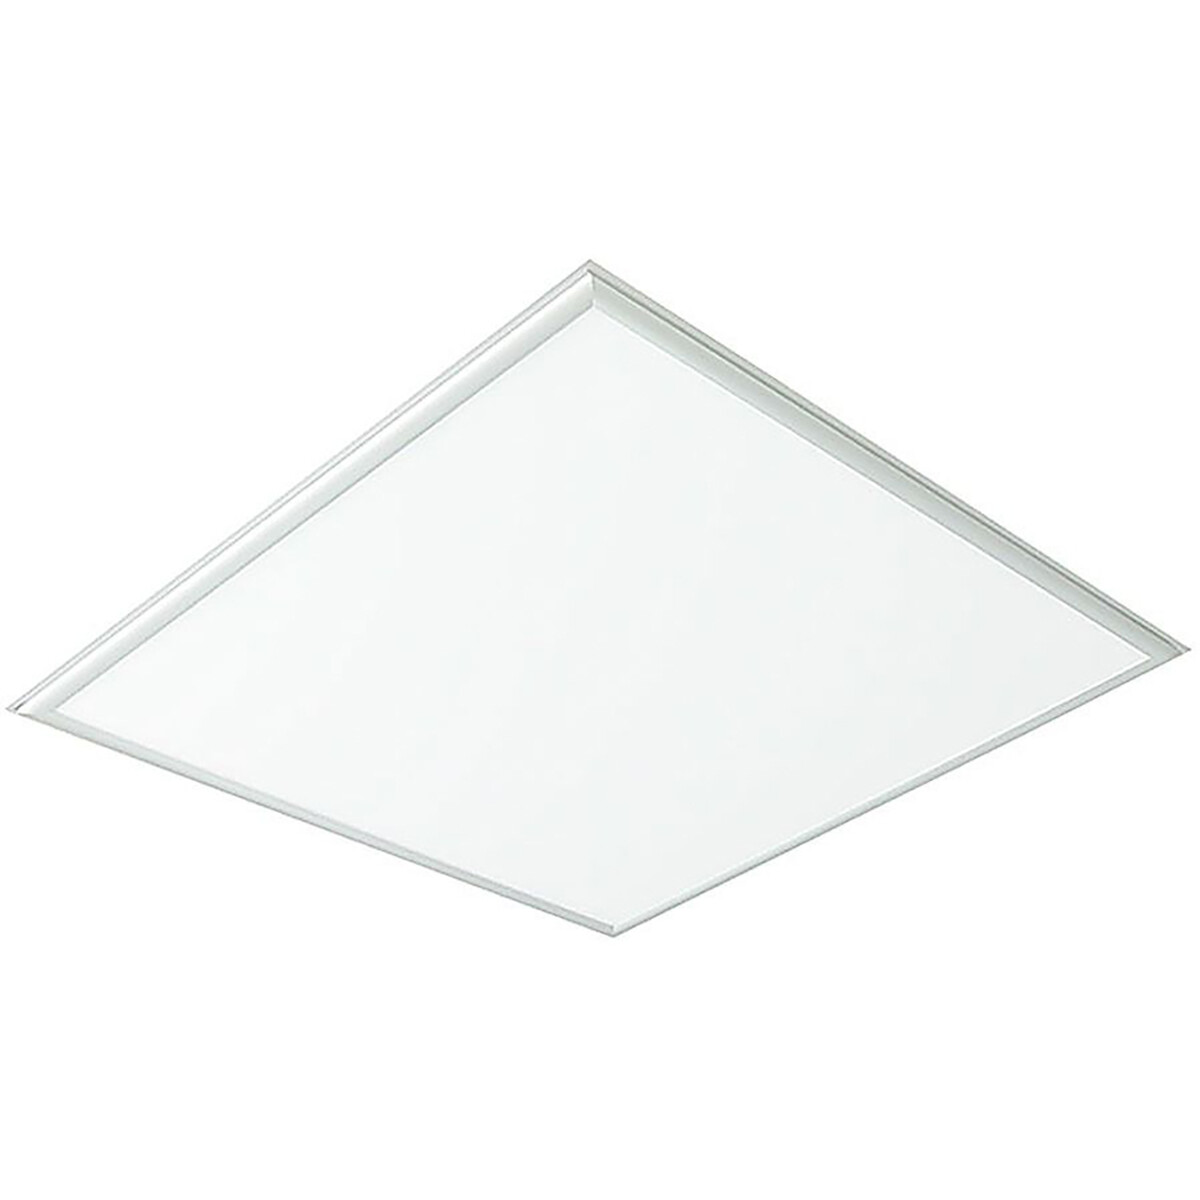 LED Paneel - Viron Viska - 60x60 Helder/Koud Wit 6400K - 36W Inbouw Vierkant - Mat Wit - Aluminium